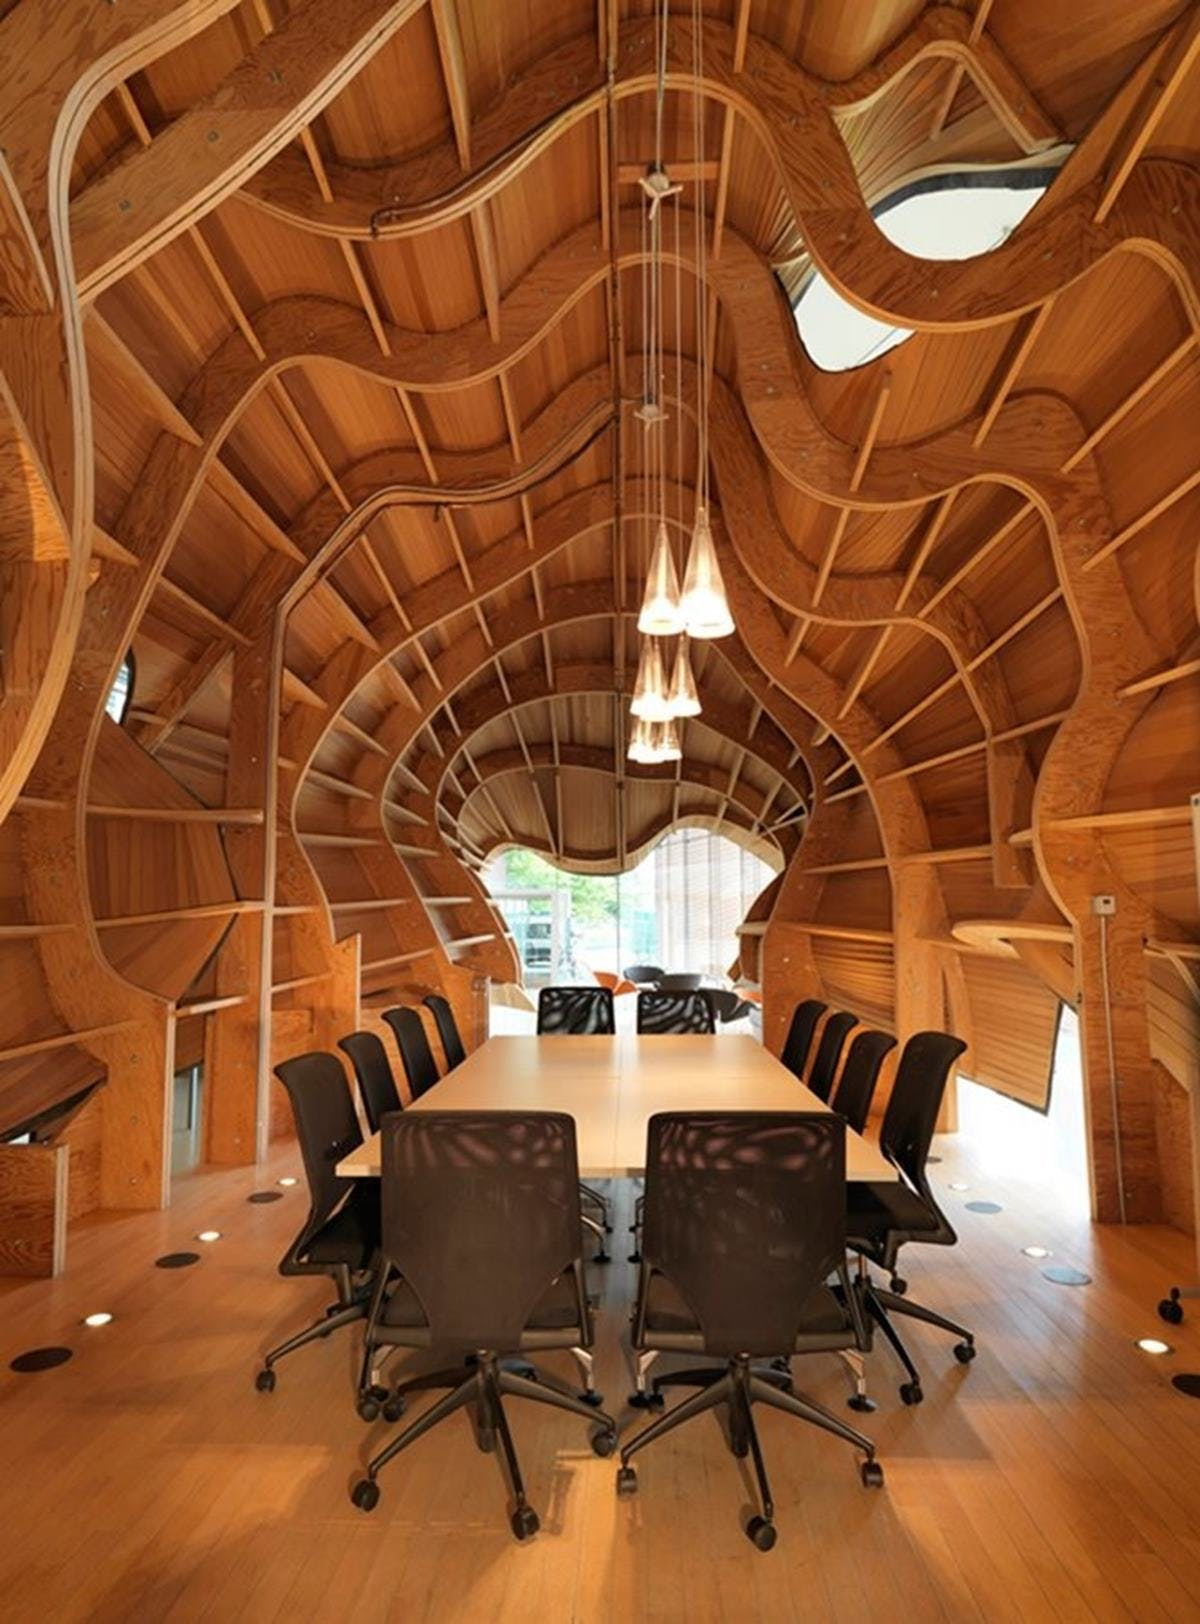 This wood enclosure